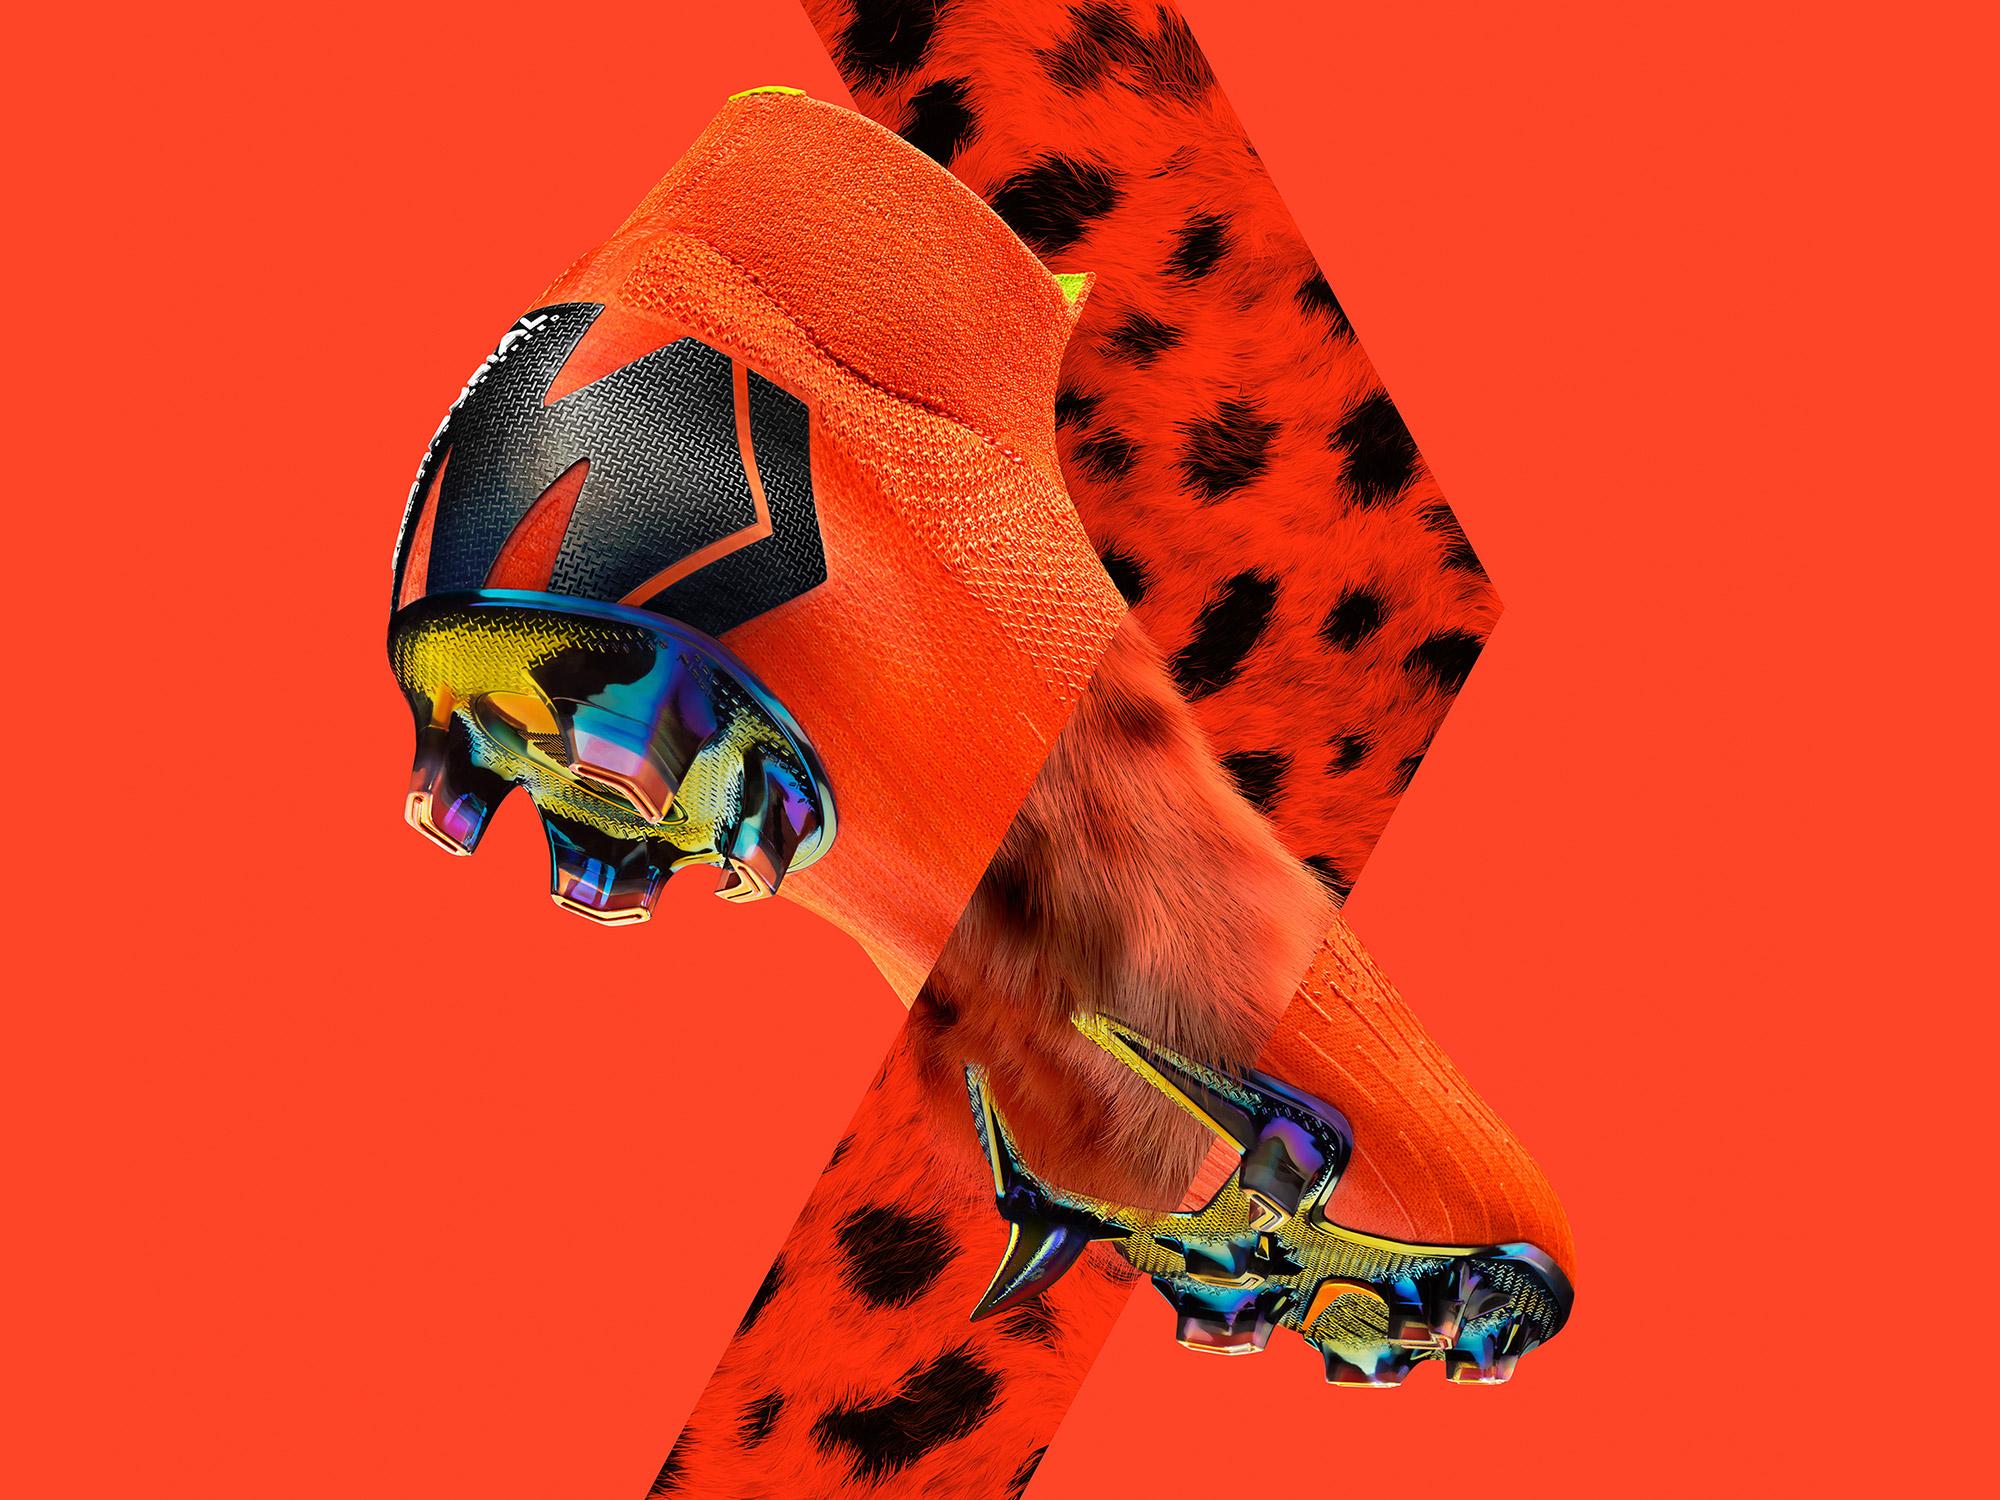 Nike-News-Mercurial-Vapor-360-Football-Soccer-Cleat-Boot_77438